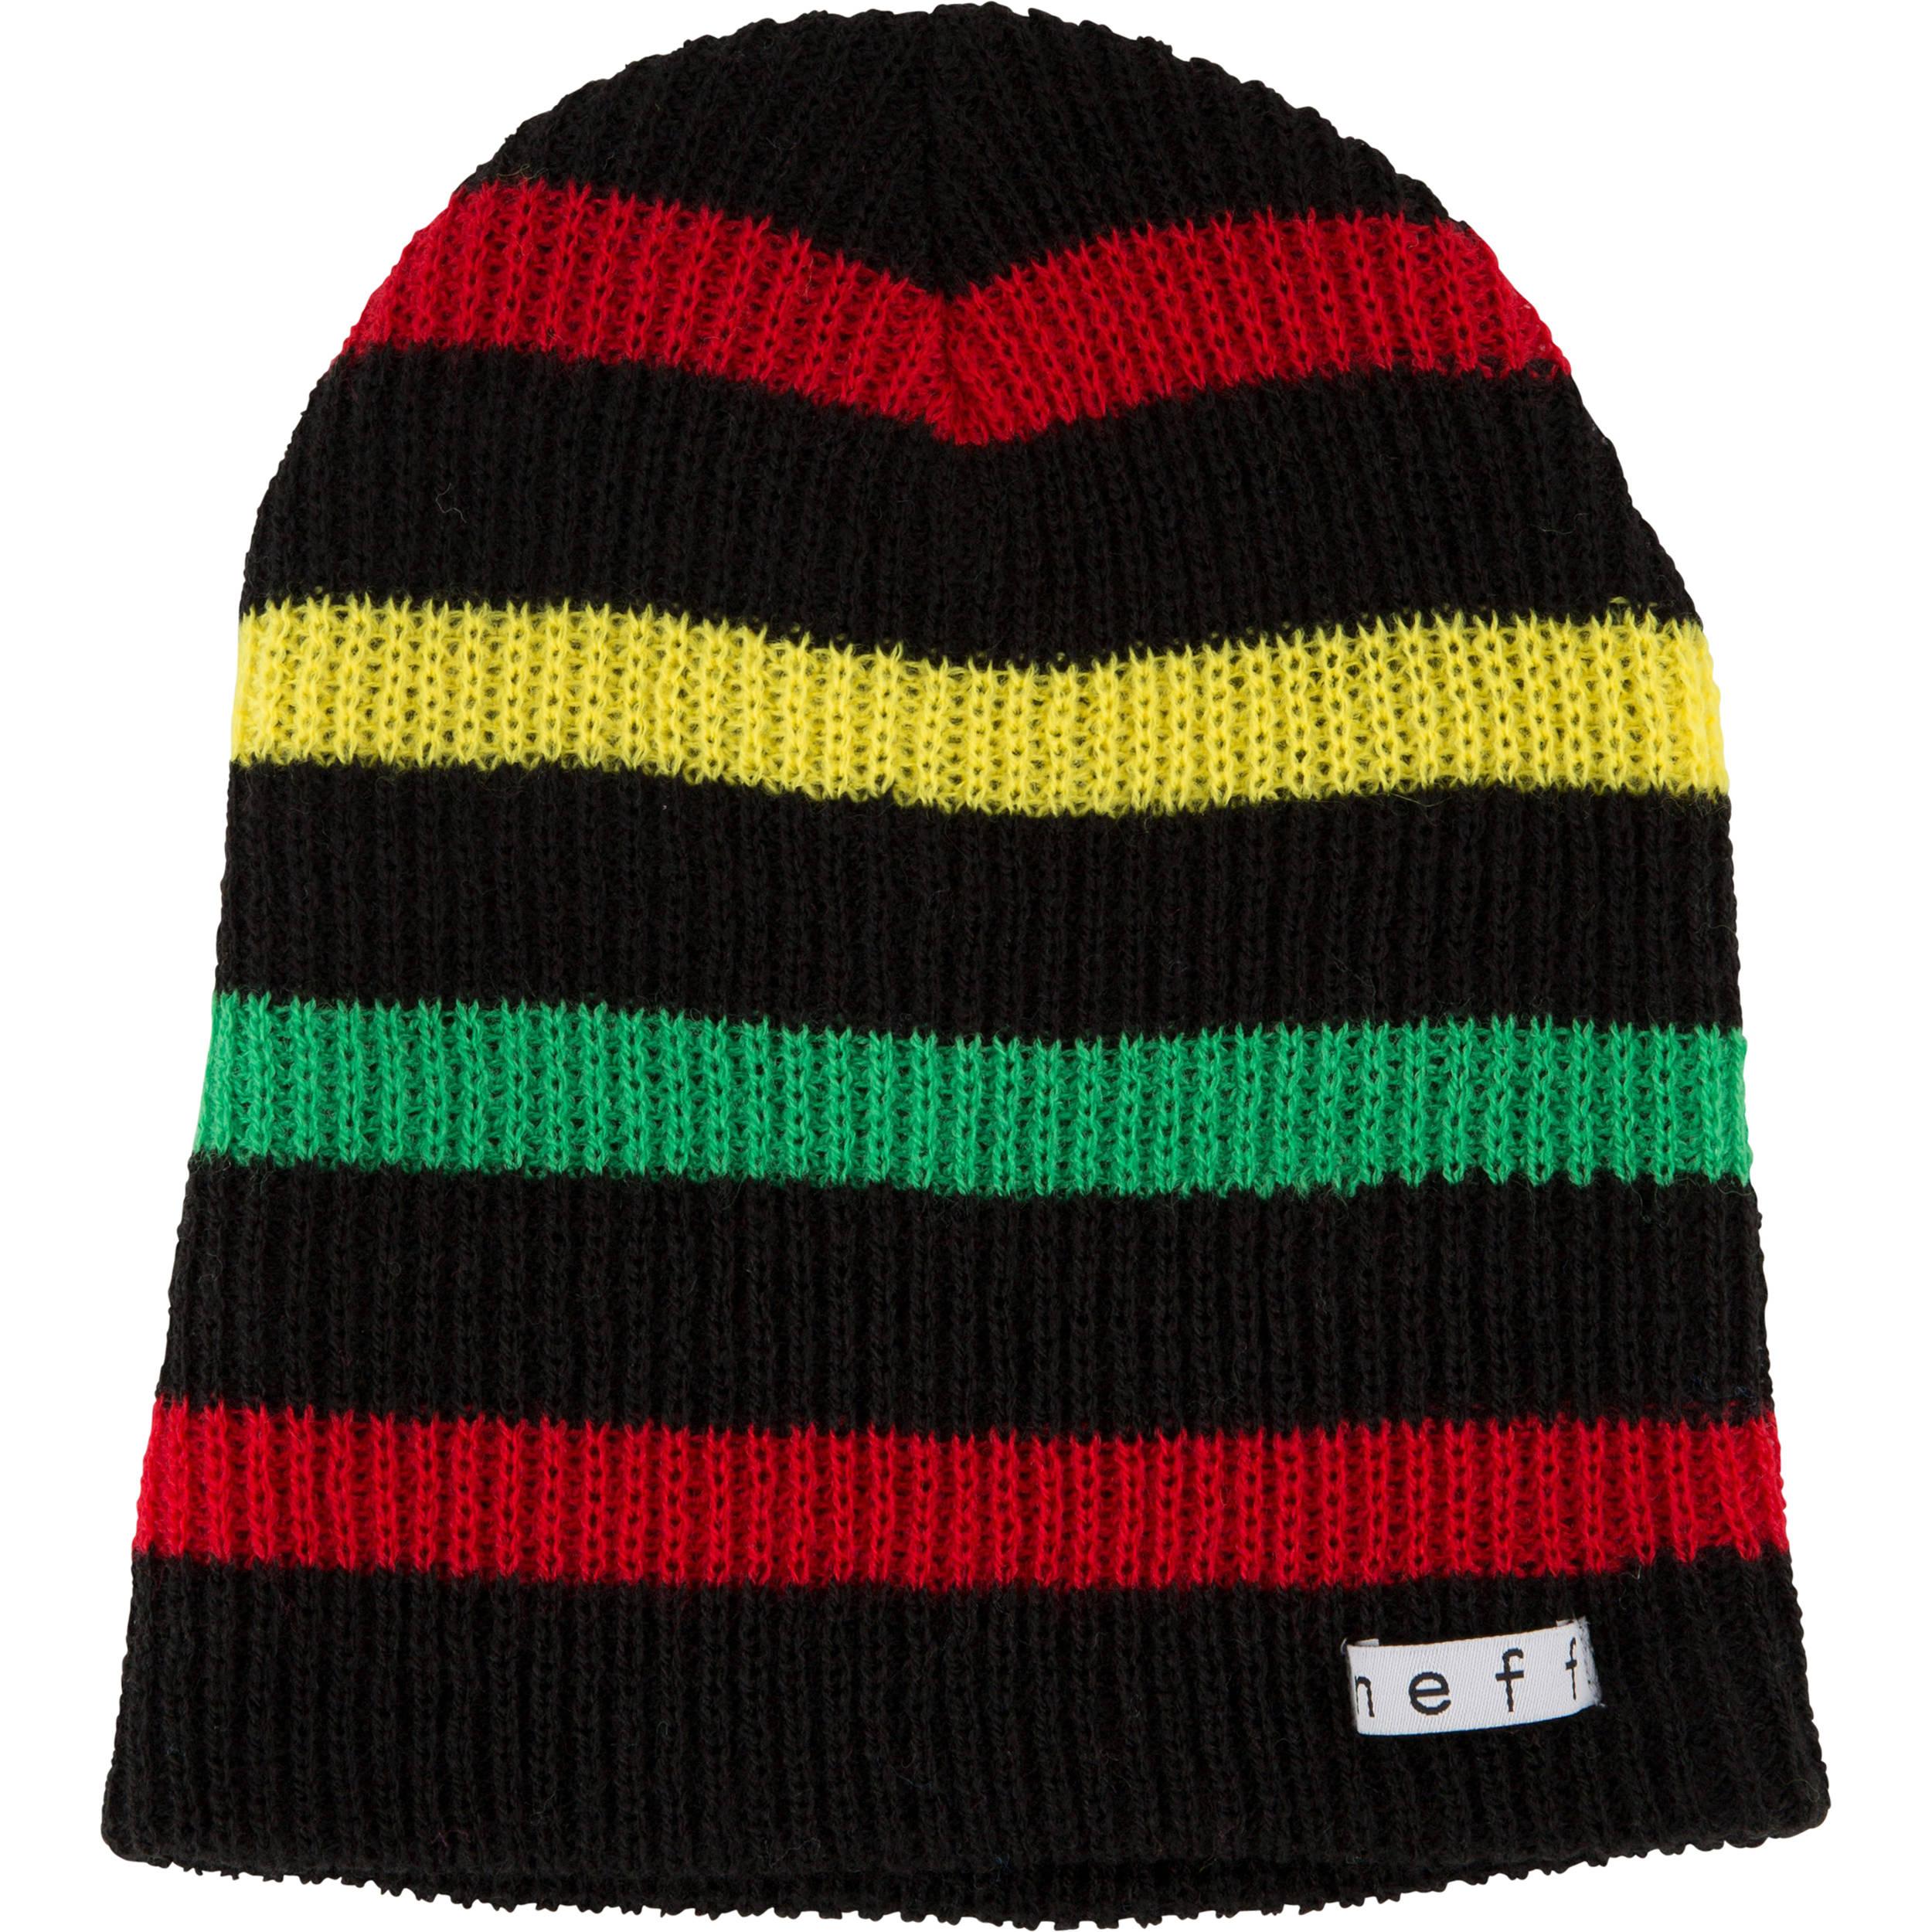 Neff Daily Stripe Beanie (Black Rasta) NF00007-BKRS B H Photo c57a49c737cd